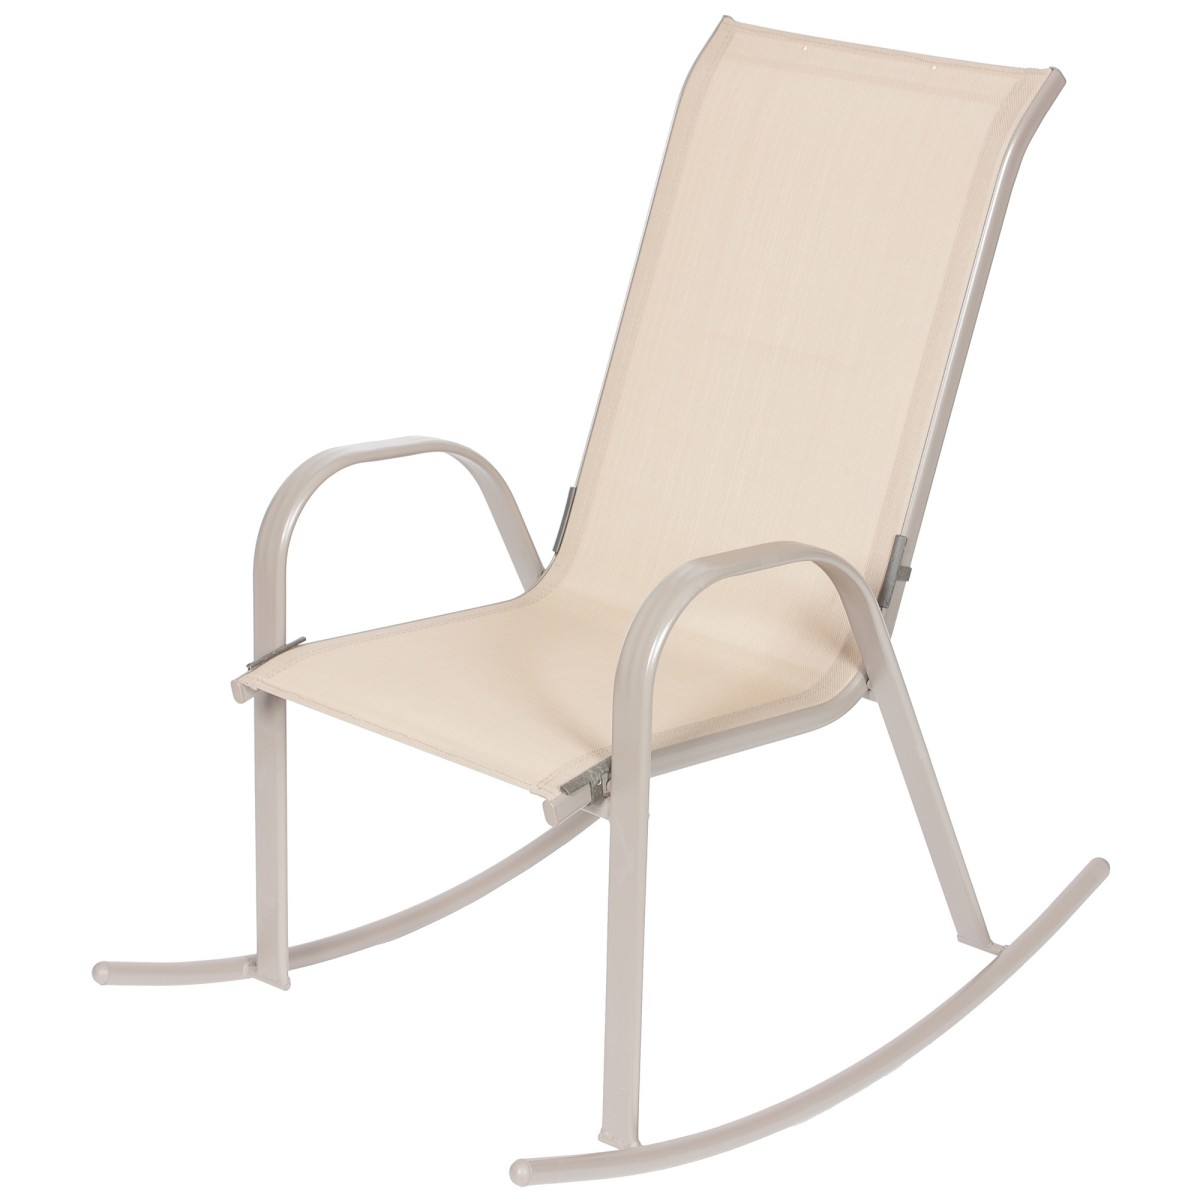 Кресло-качалка 540/620x980x910 мм металл/ткань  цвет бежевый